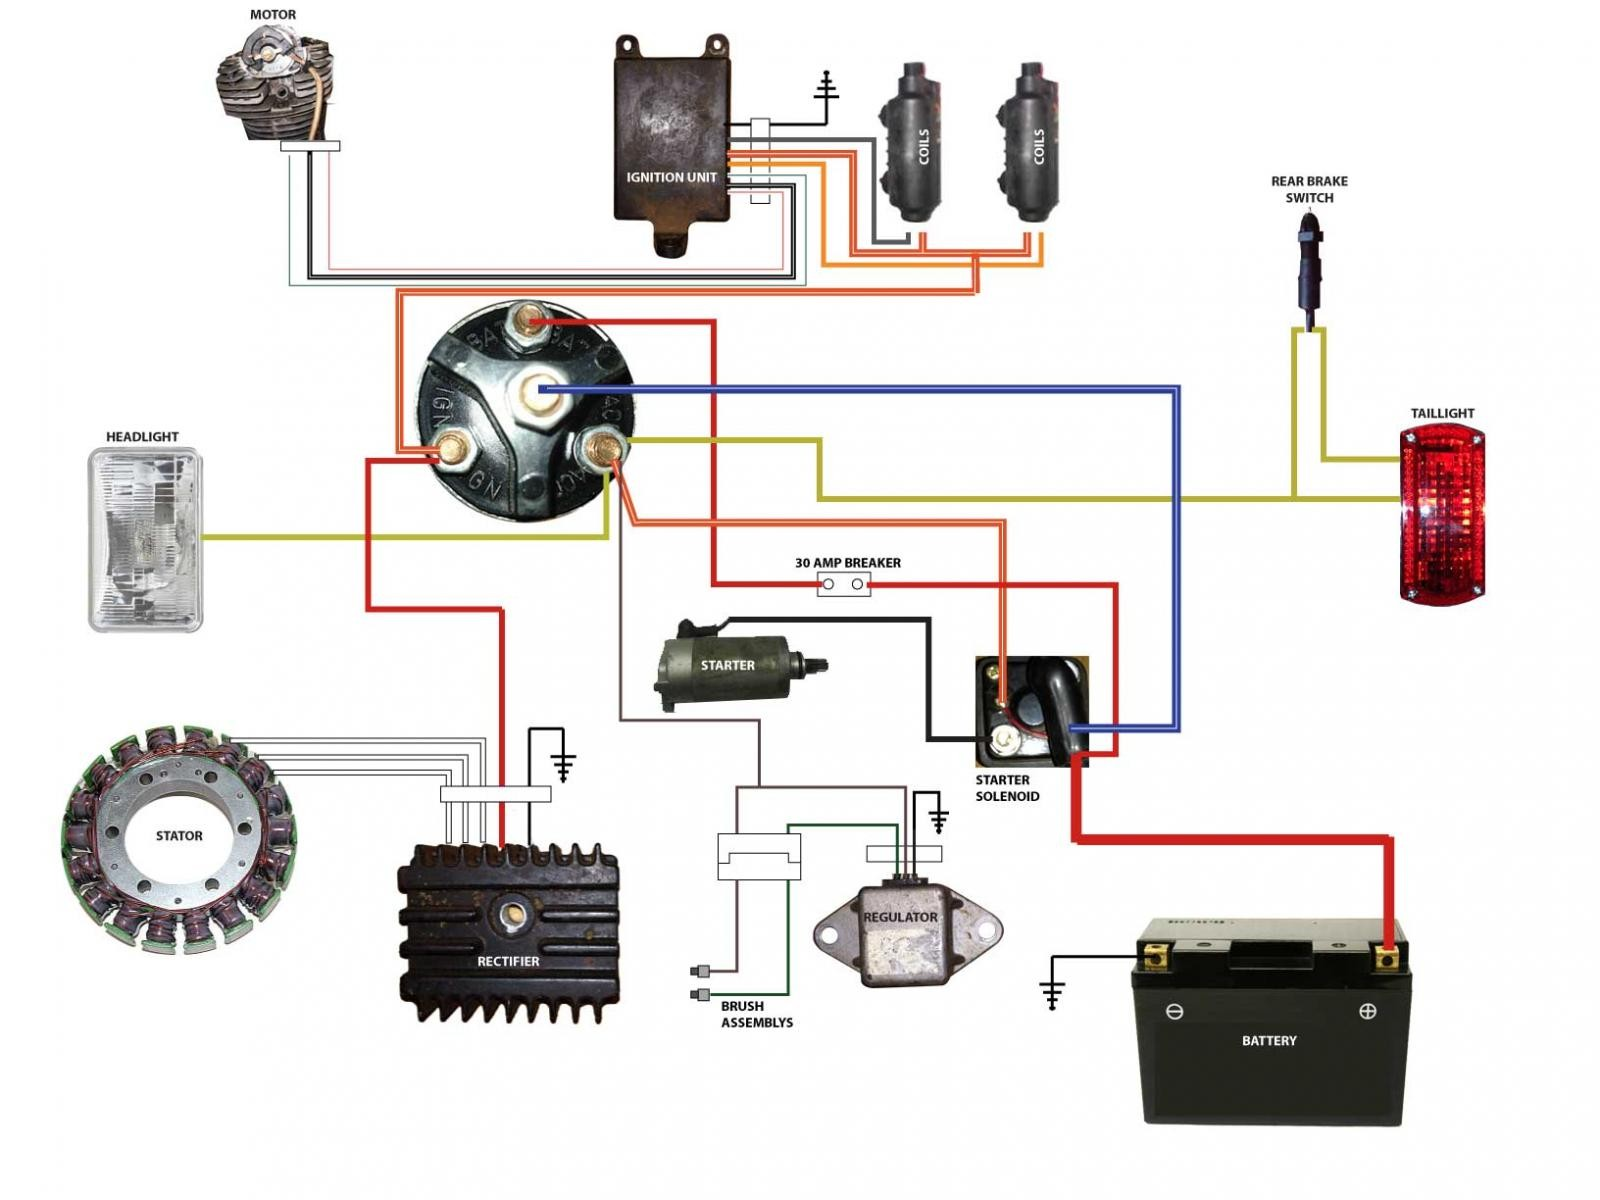 diagram] 1974 cb750 bobber wiring diagram full version hd quality wiring  diagram - speakerdiagrams.congressosinpf.it  diagram database